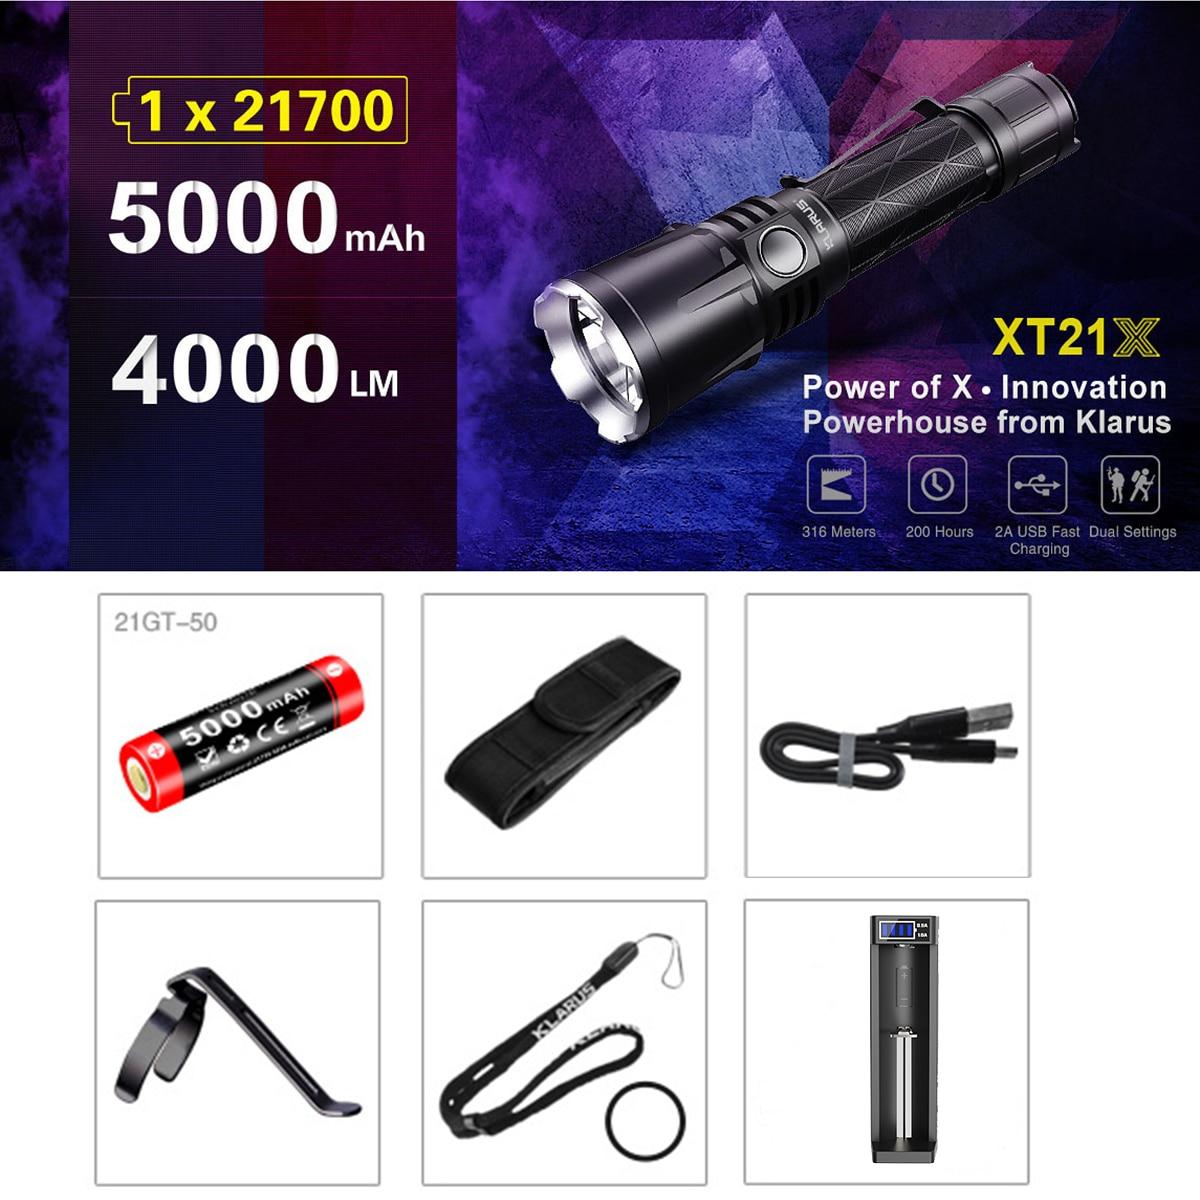 KLARUS XT21X CREE XHP70.2 P2 LED 4000 lumen 7 Modus Tactical Led Taschenlampe Micro-USB 2A 5000 mAh Li-Ion batterie für Selbstverteidigung